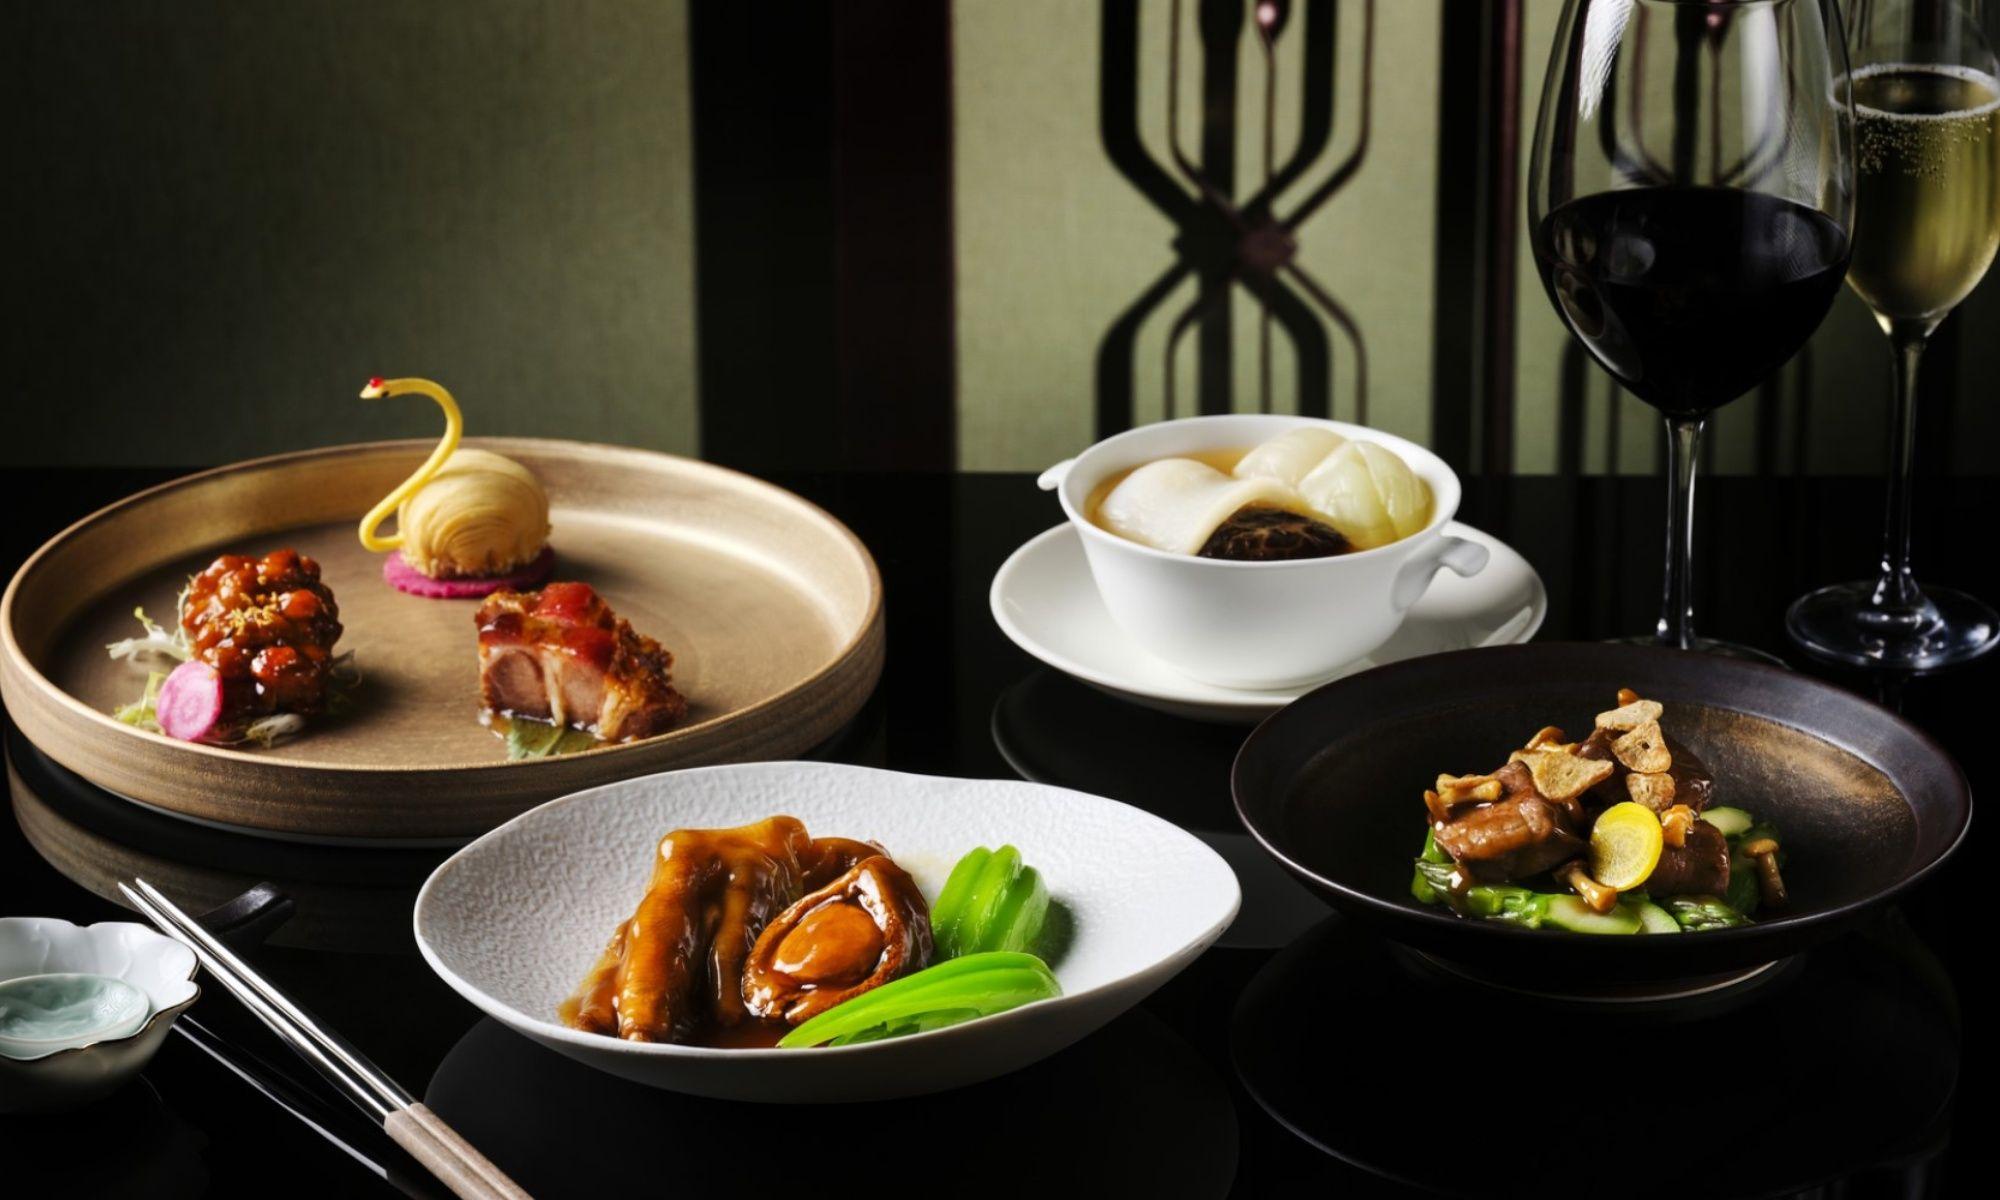 Hung Tong Offers Brand New Wine Pairing Dinner Menus